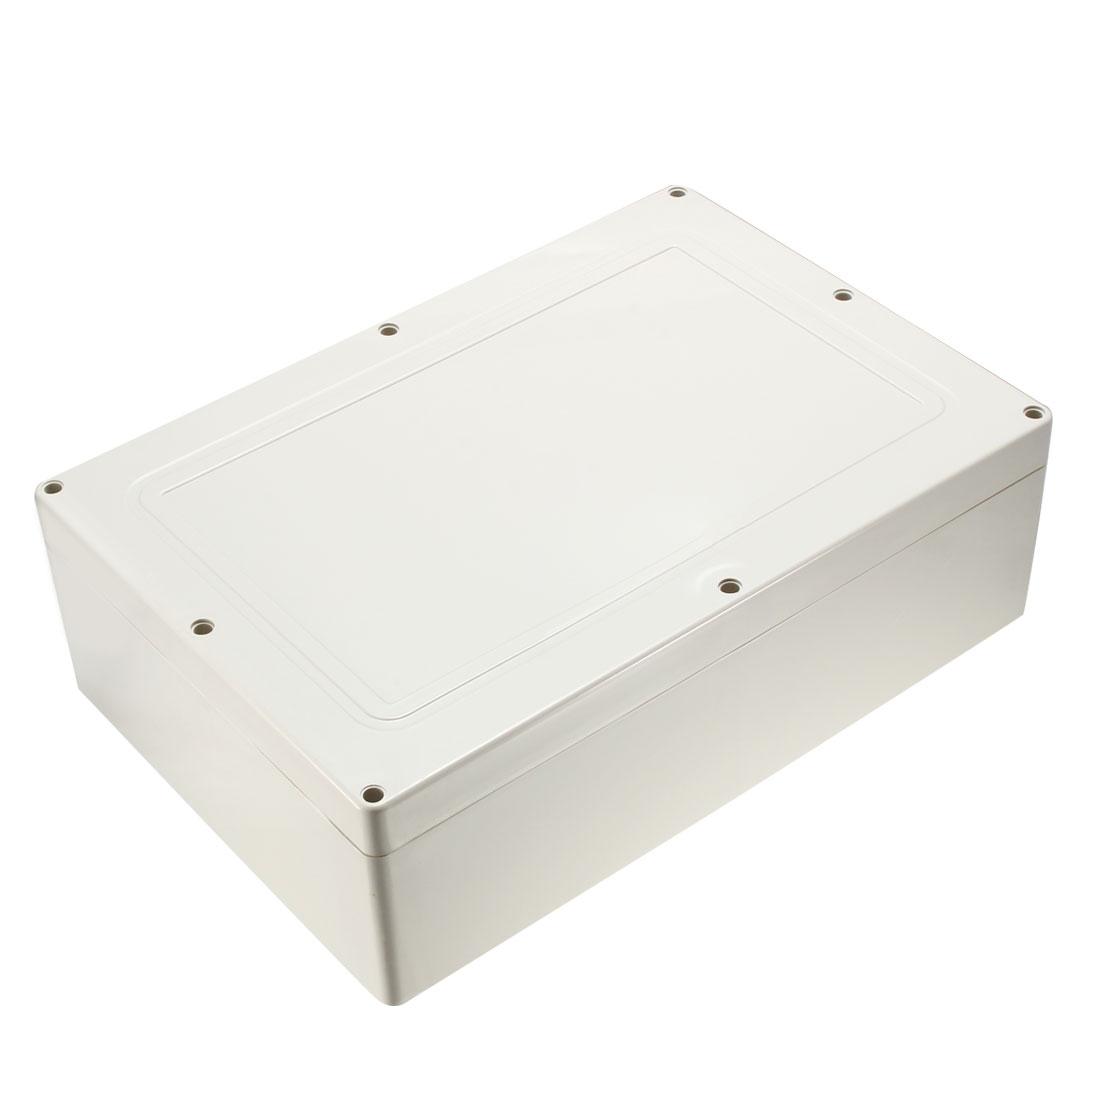 thumbnail 6 - Electronic Dustproof IP65 ABS Plastic DIY Junction Box Enclosure Project Case